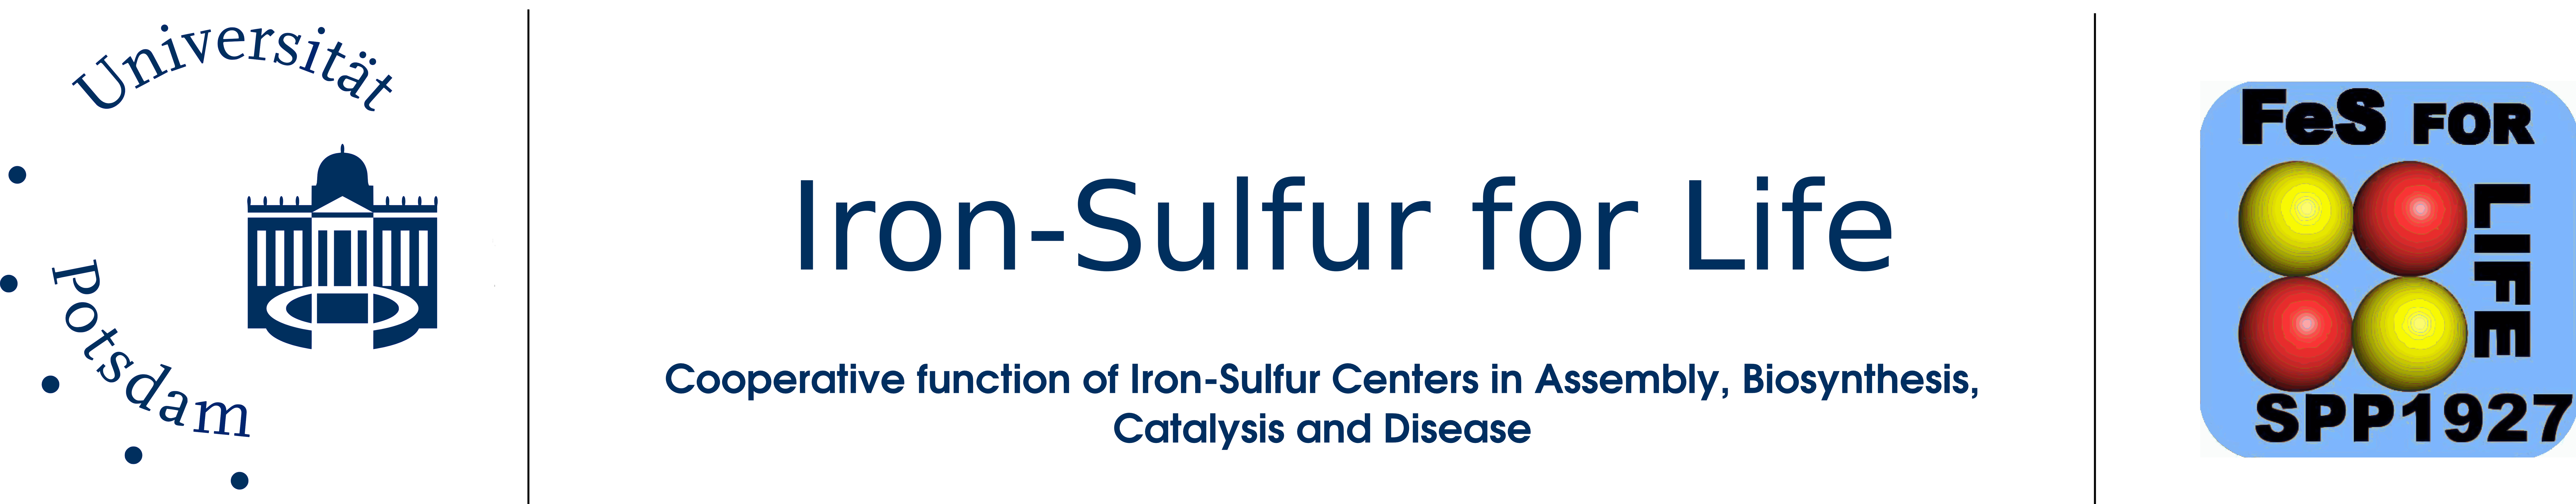 Publications – ironsulfurforlife